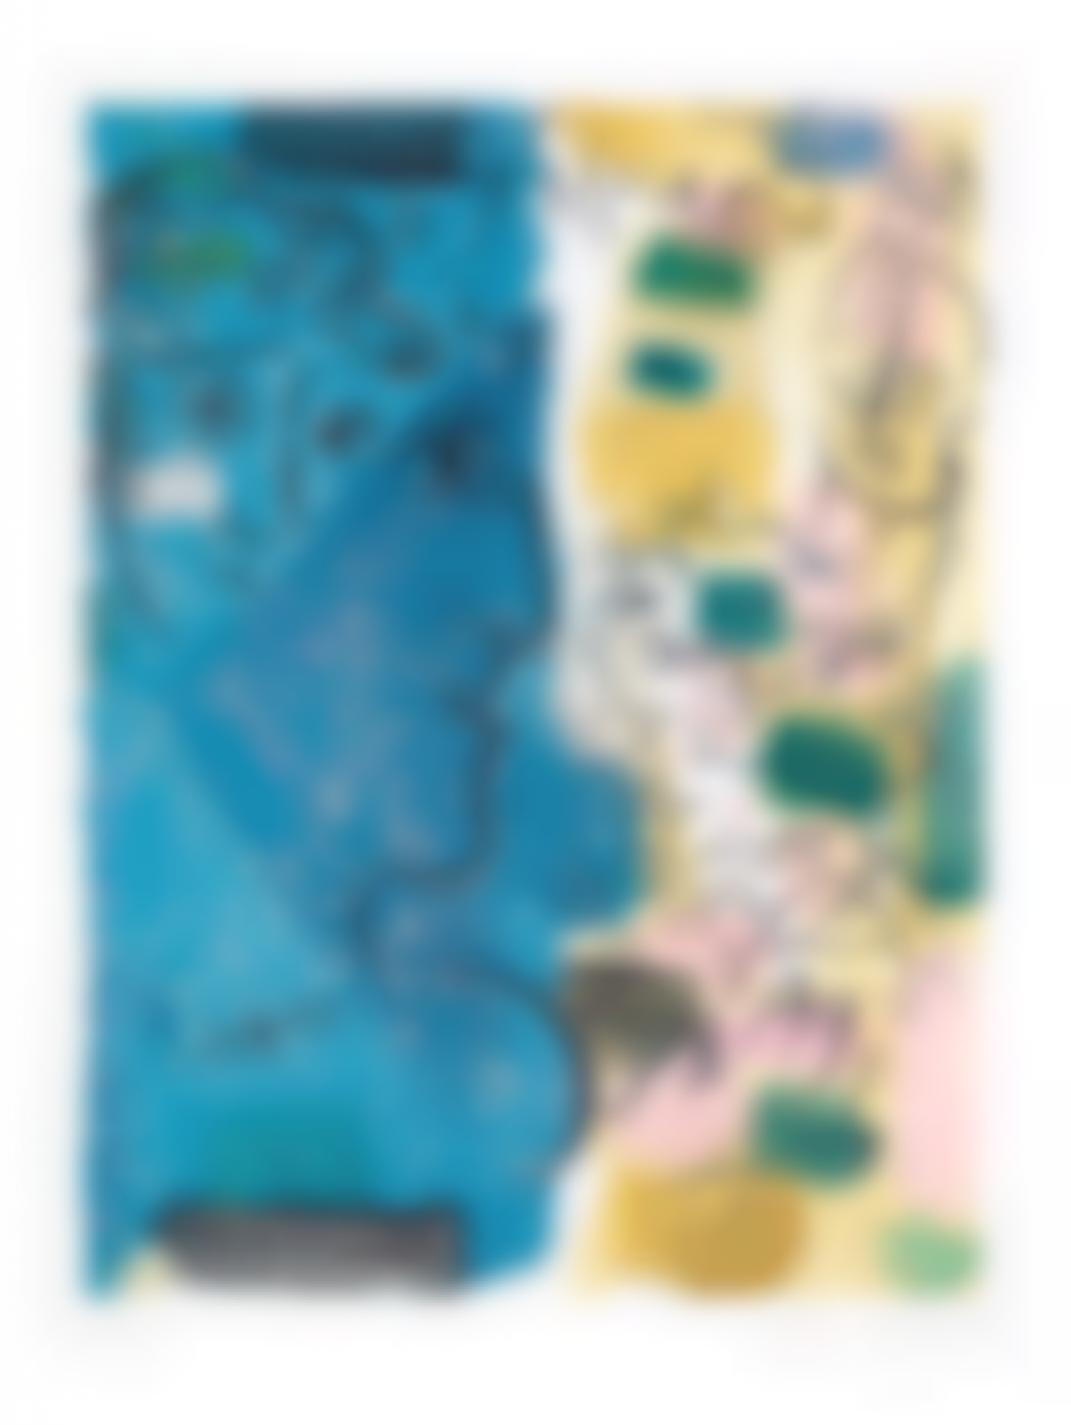 Marc Chagall-Affiche Dexposition (Exhibition Poster)-1967